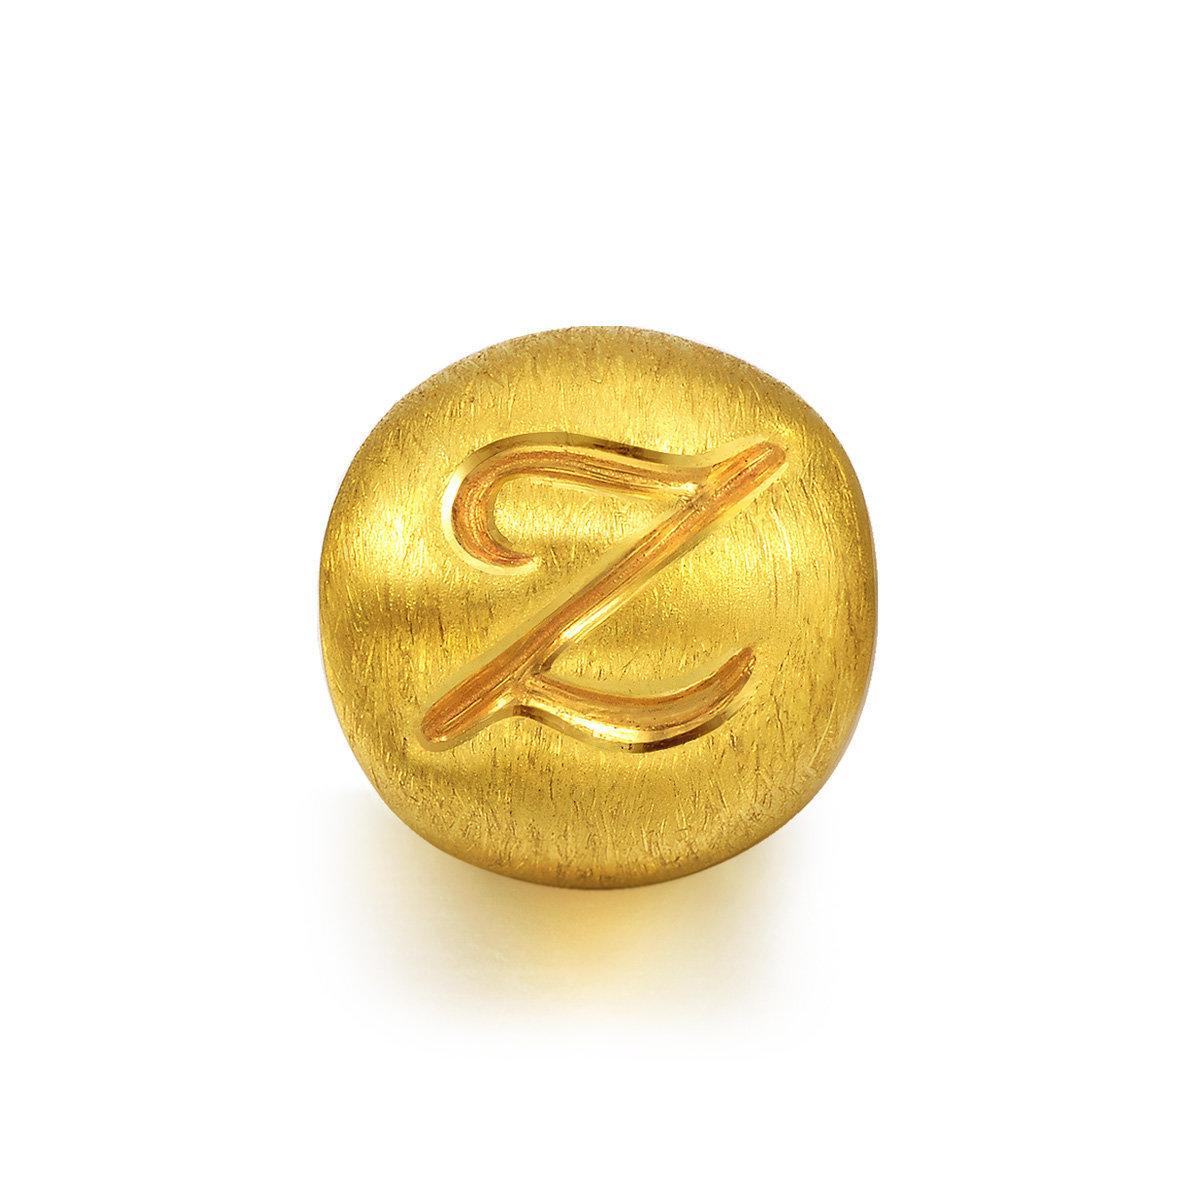 Charme 'Alphabets' 999 Gold Letter Z Charm (Bracelet not included)